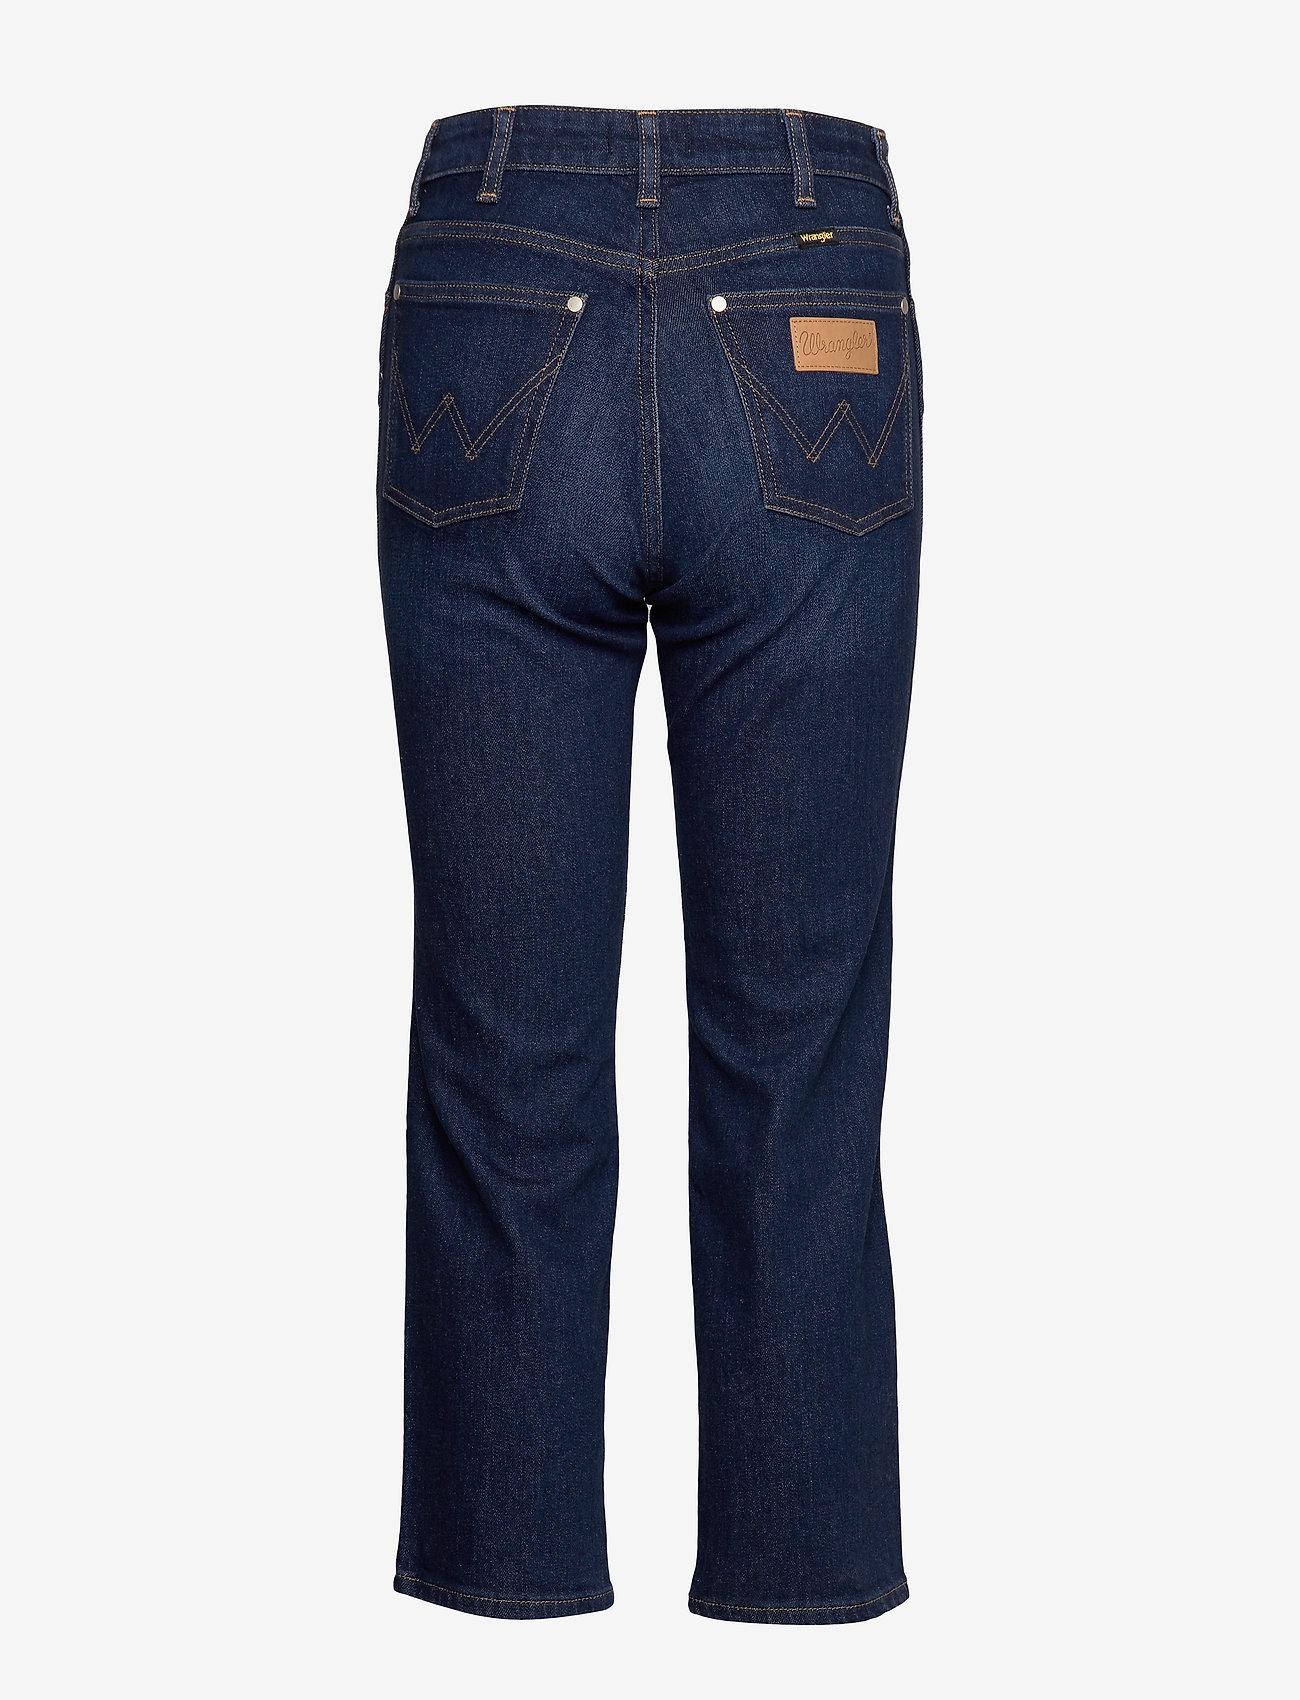 Wrangler - THE RETRO - straight jeans - dark blue